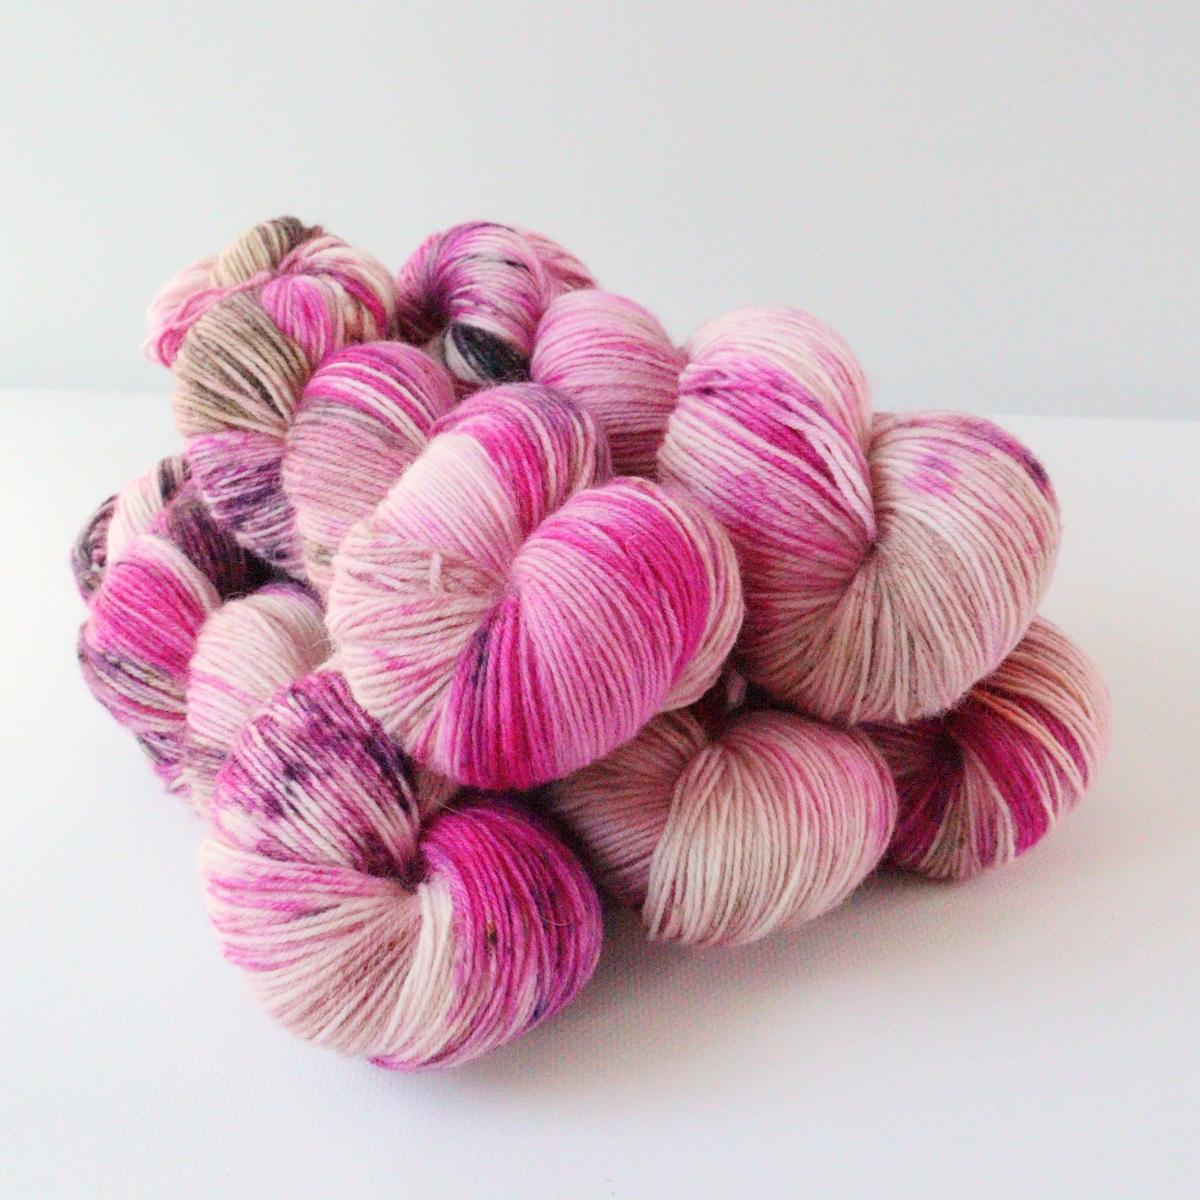 woodico.pro hand dyed yarn 086 1 1200x1200 - Hand dyed yarn / 086